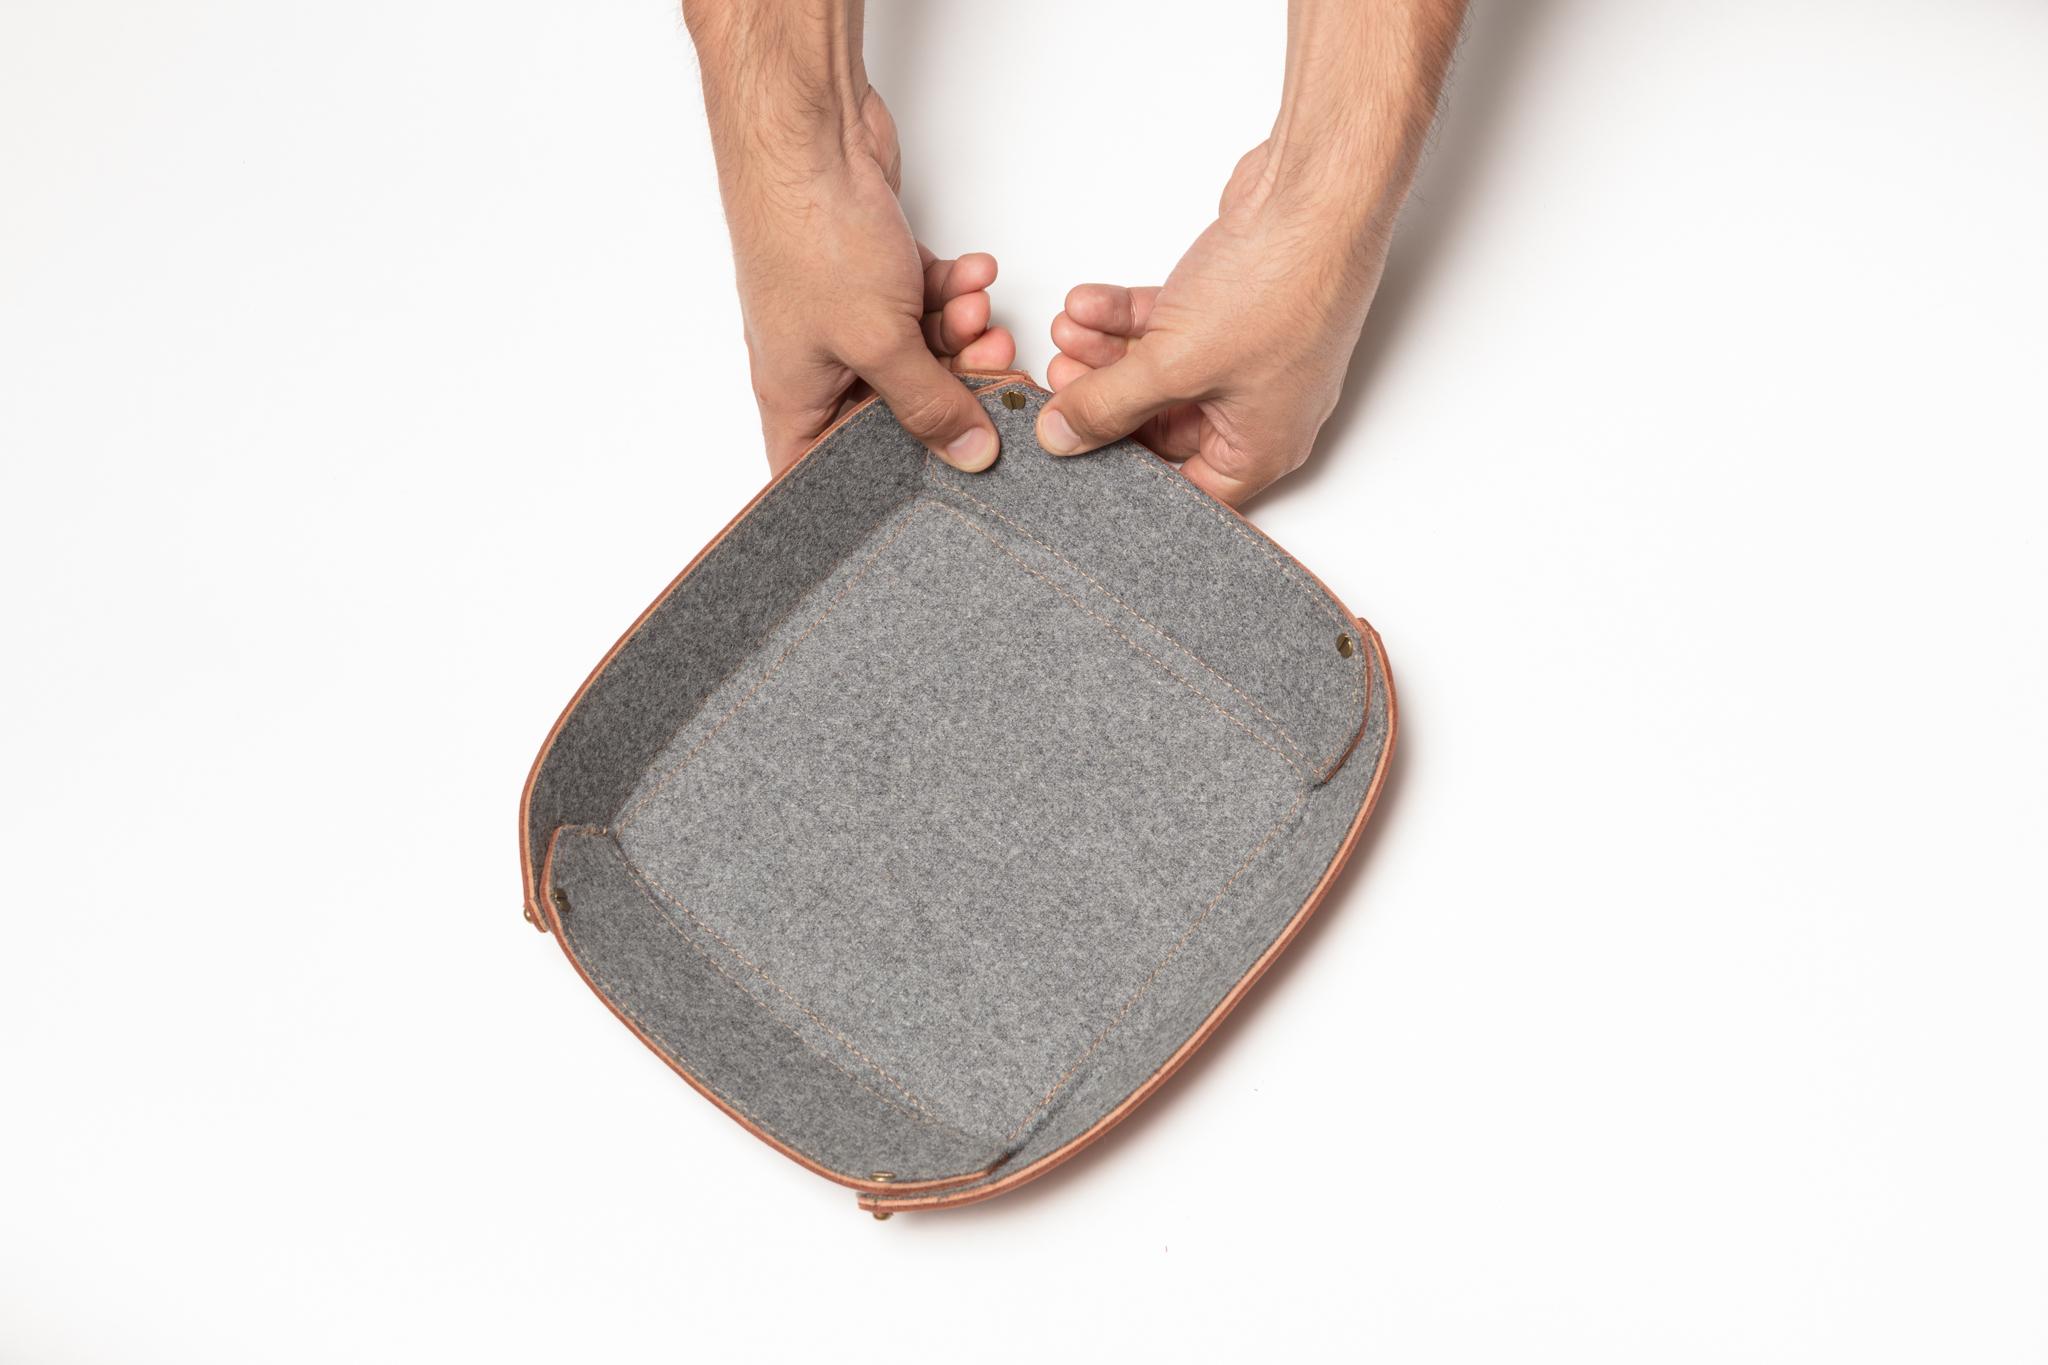 jorge-diego-etienne-fold-lo-esencial-6d